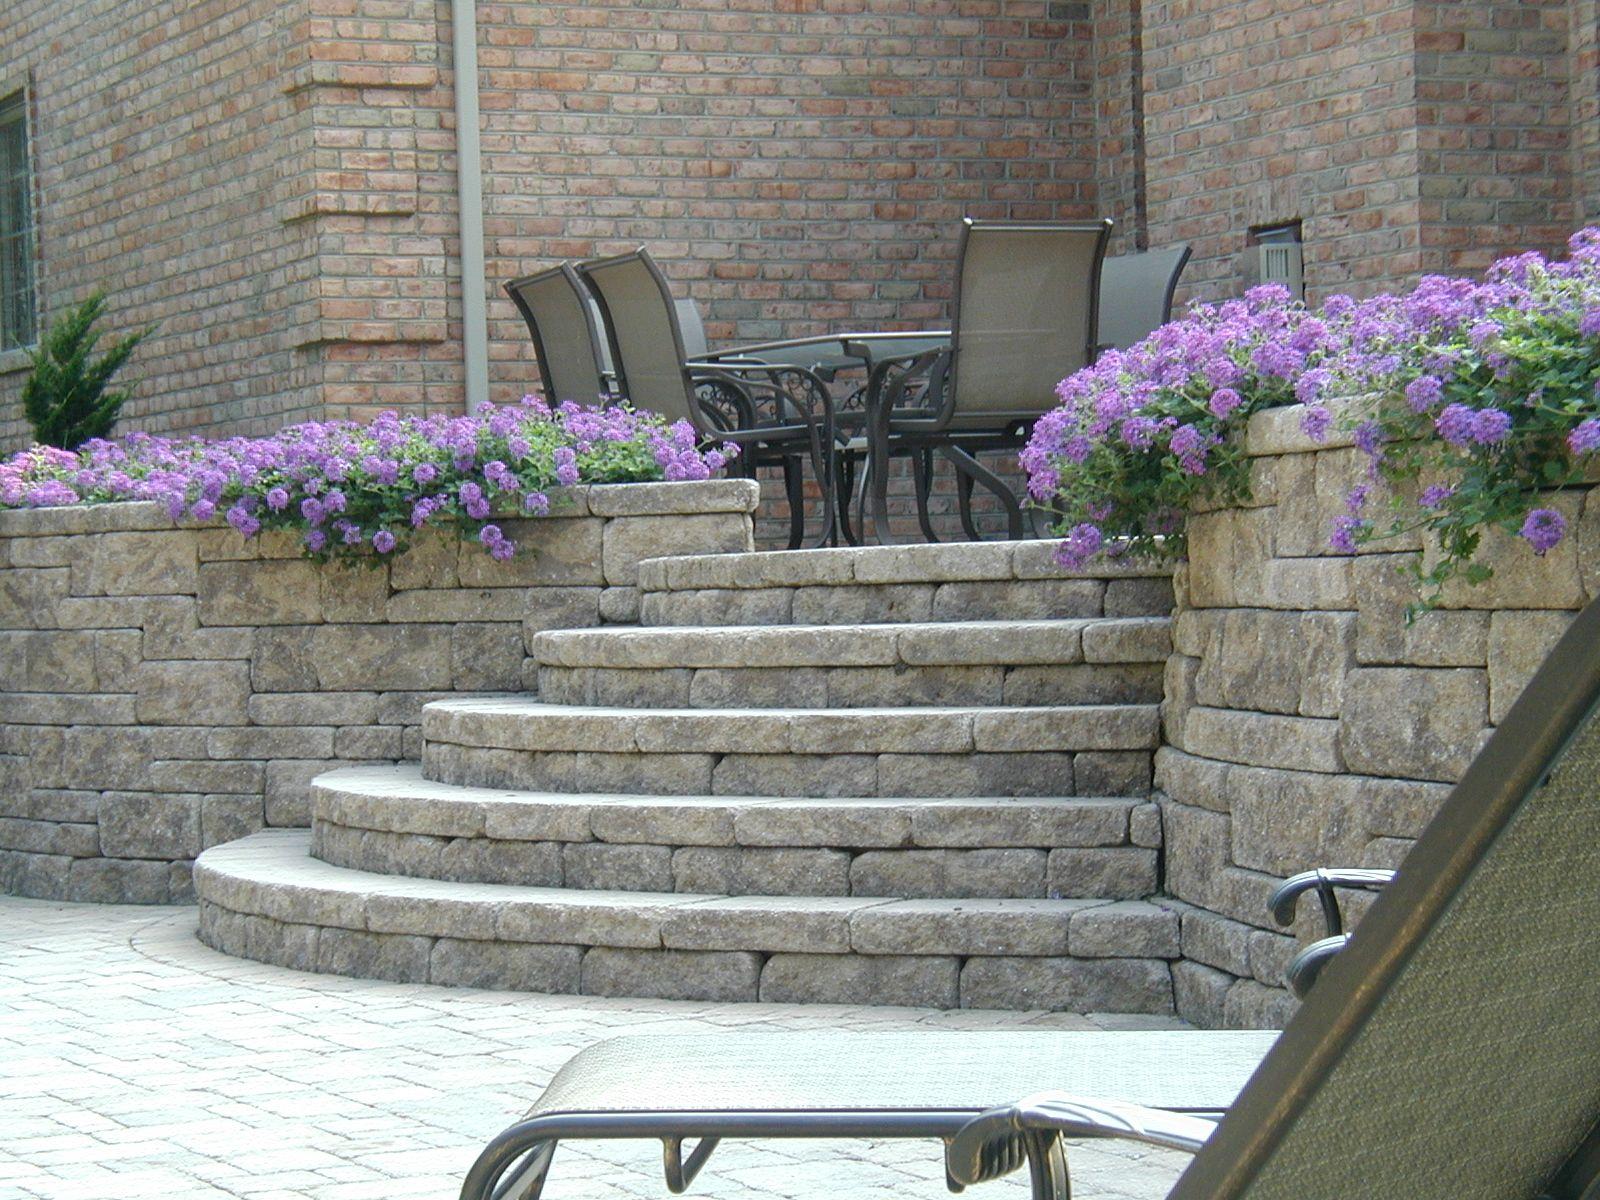 landscape block retaining wall steps | Retaining wall ideas ...